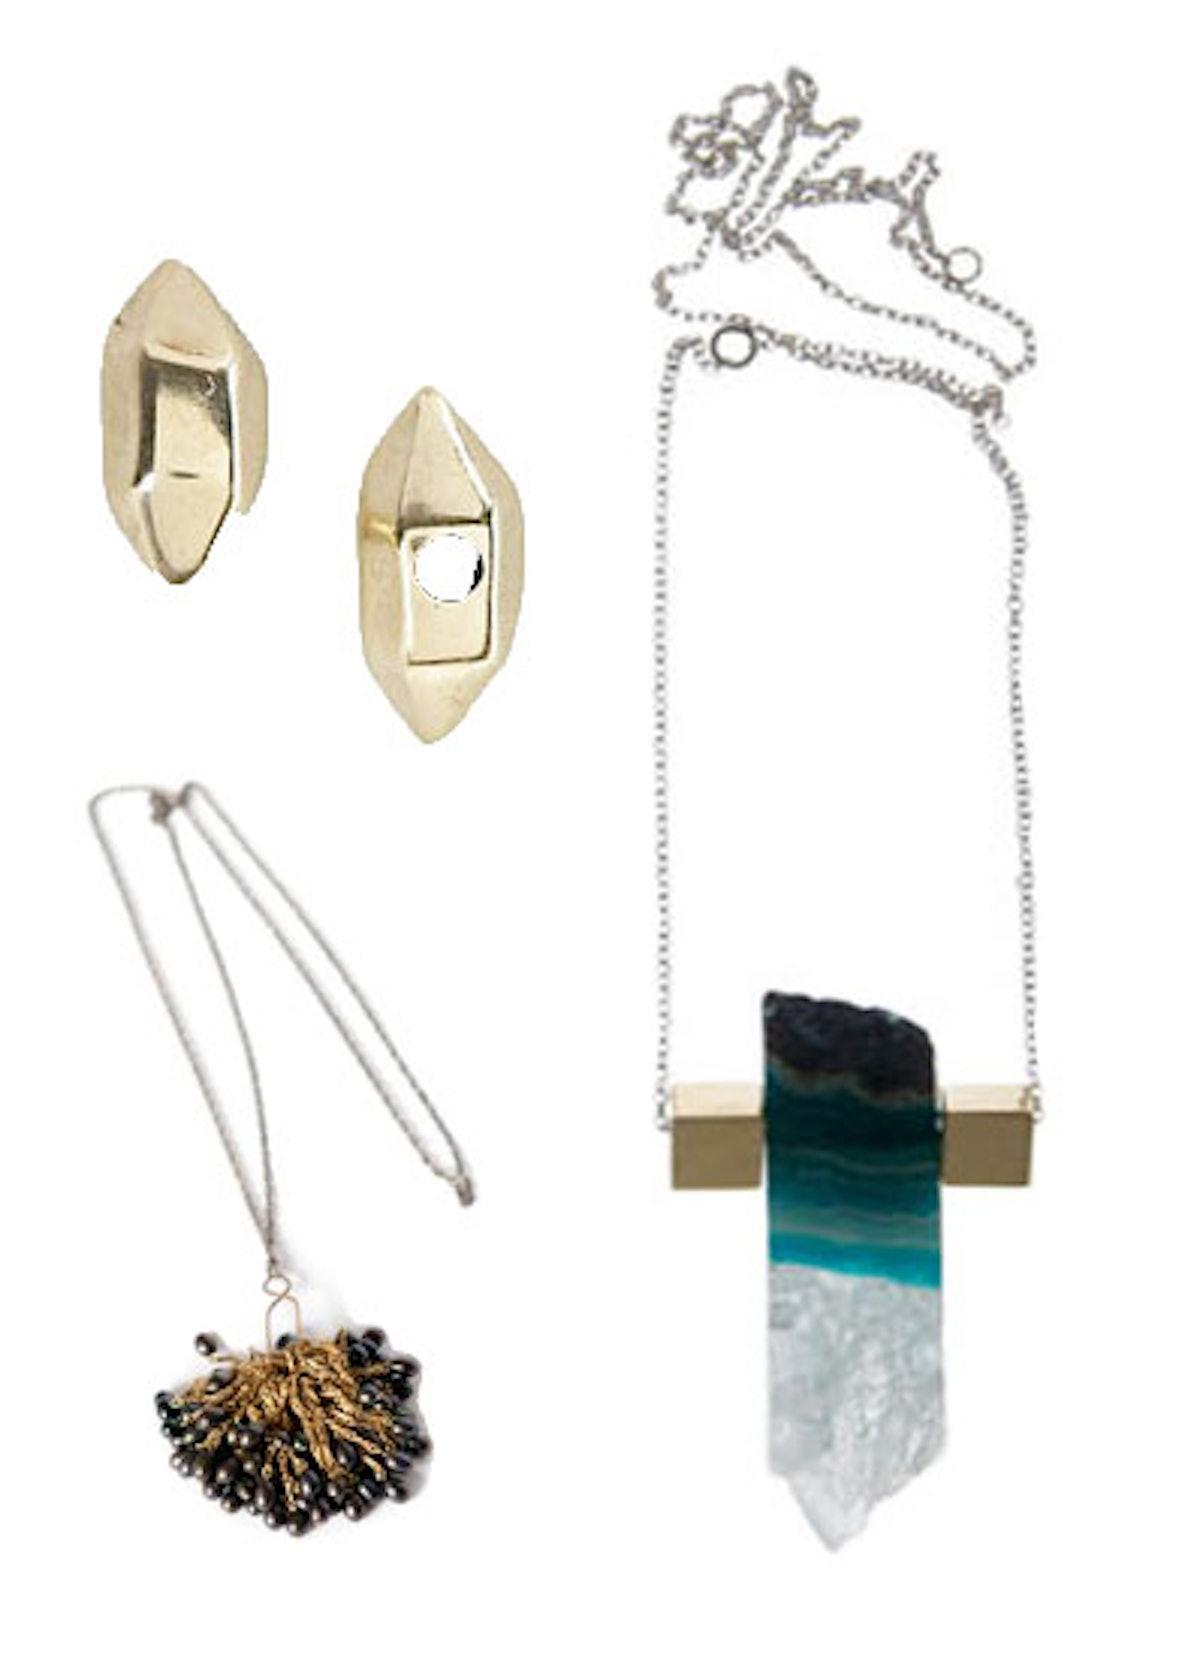 acss-brooklyn-jewelry-02-v.jpg